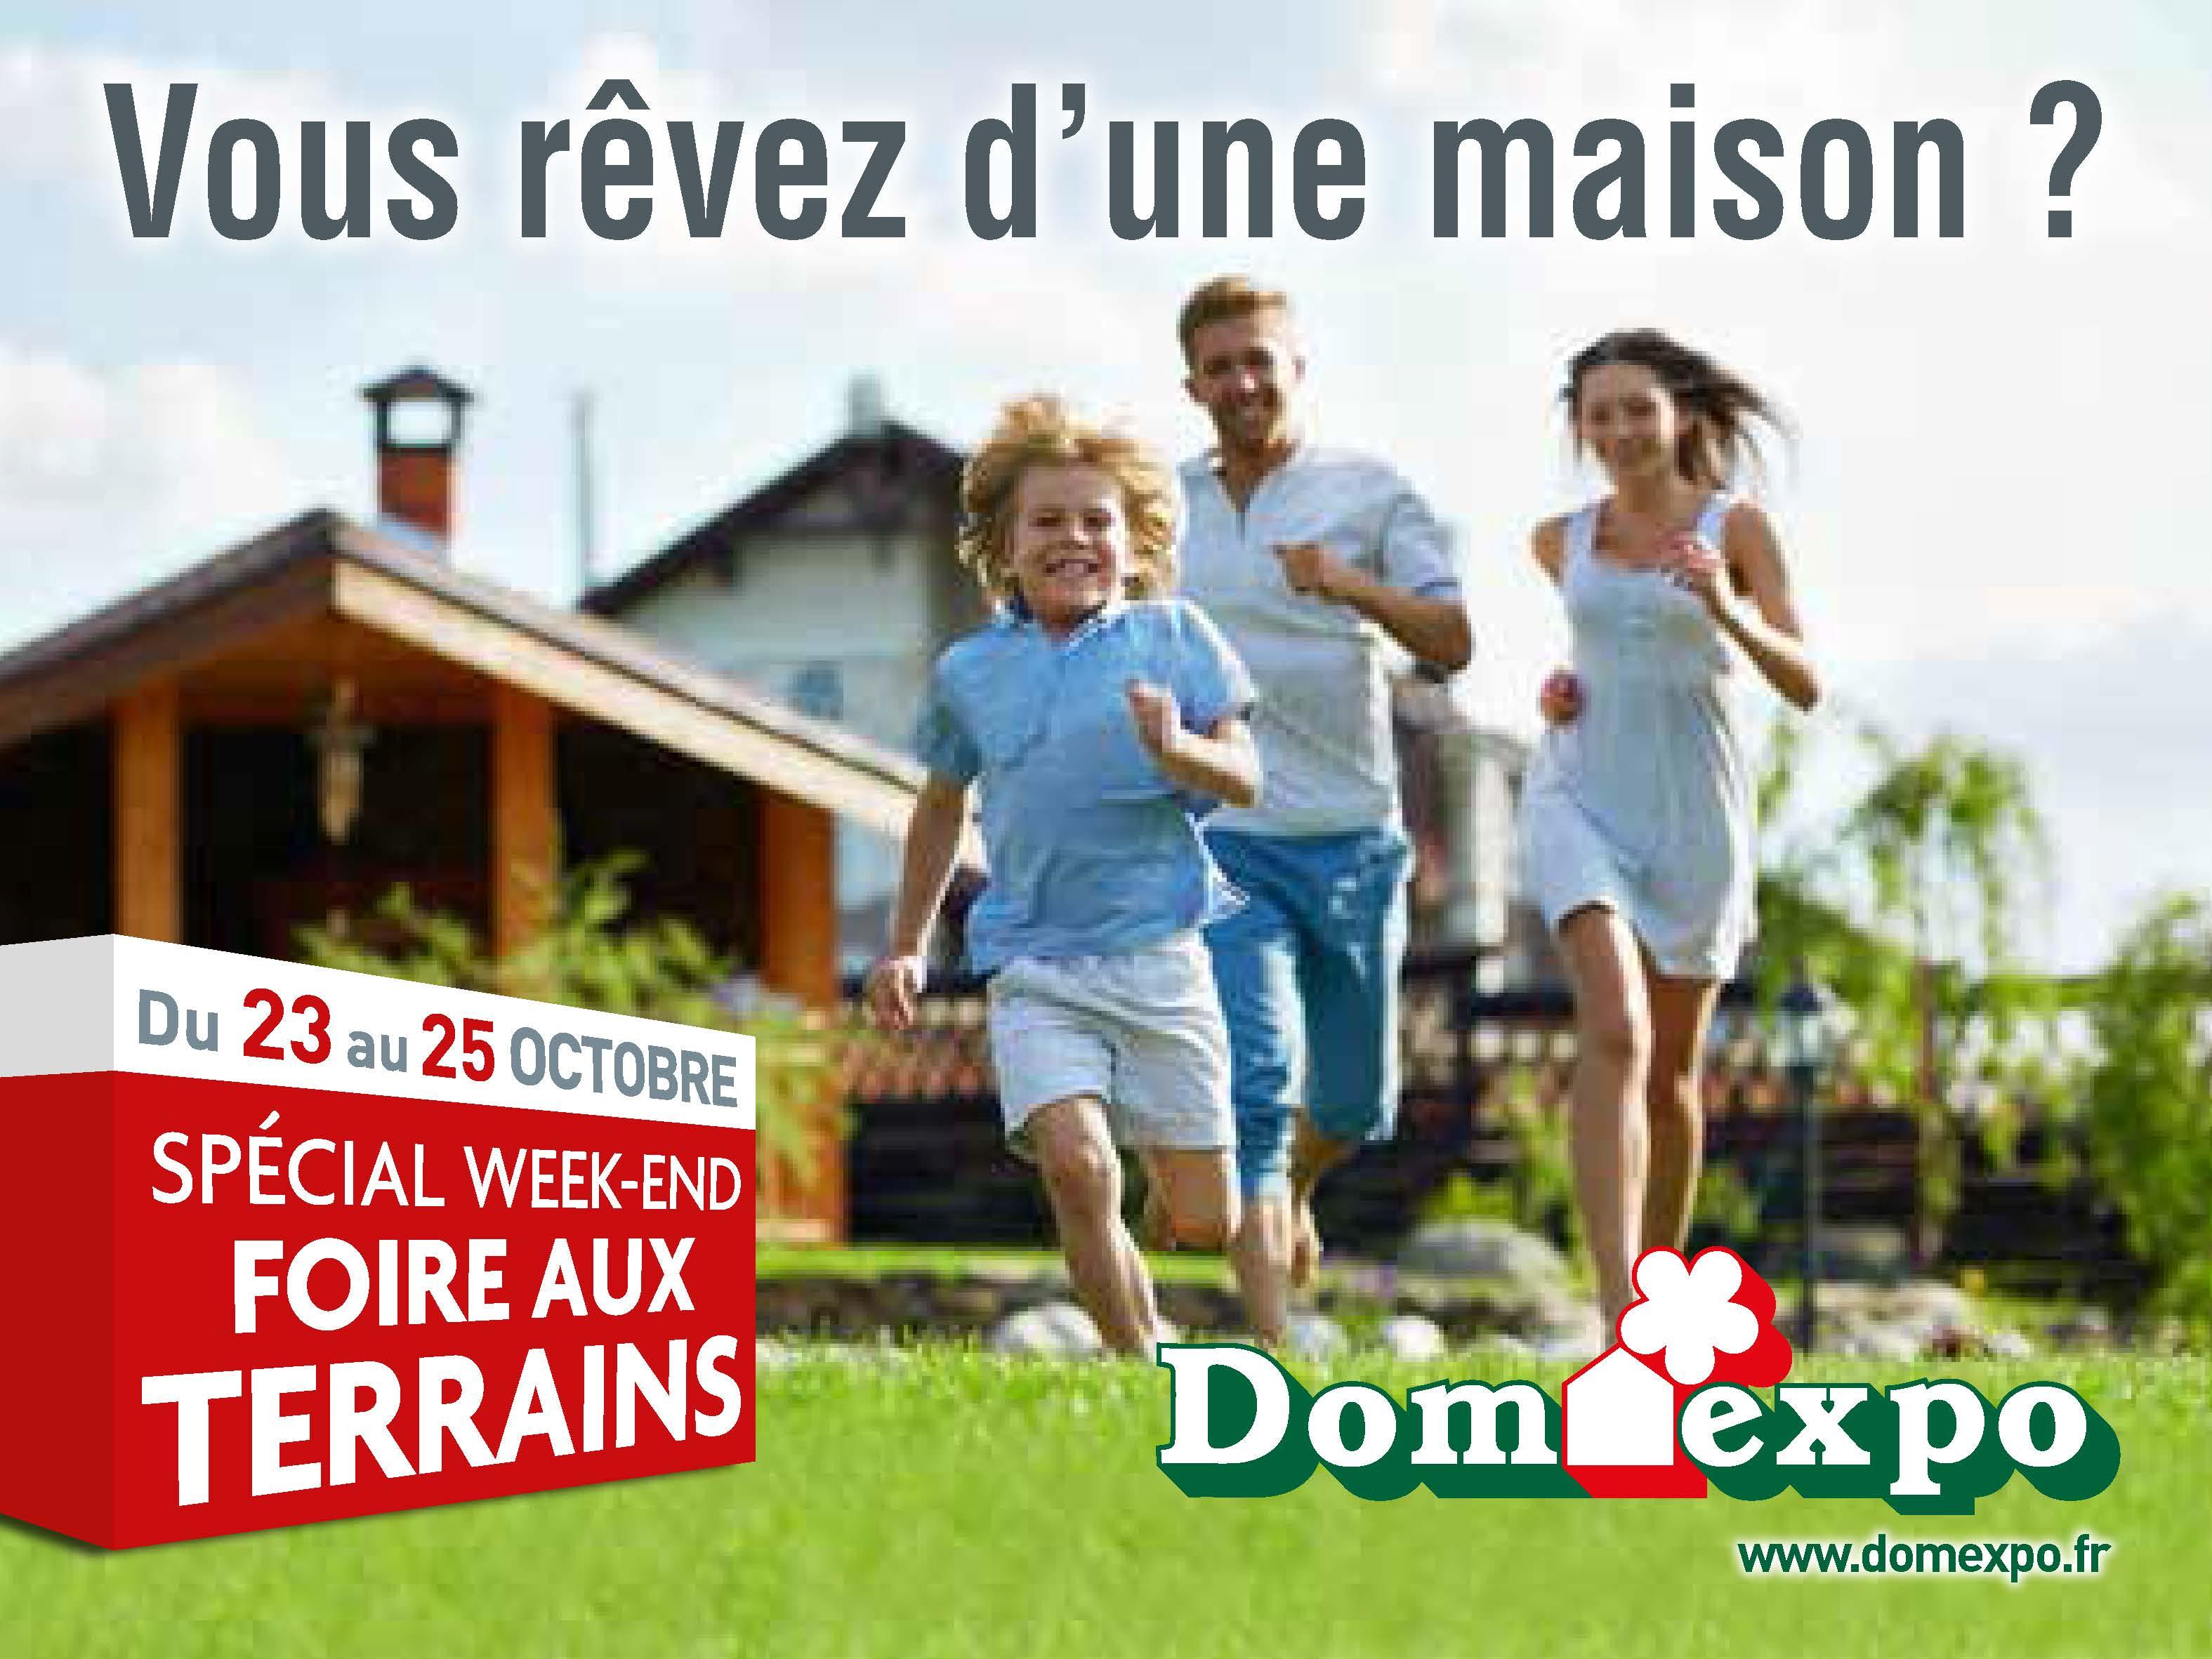 Domexpo week end sp cial foire aux terrains for Village domexpo 91